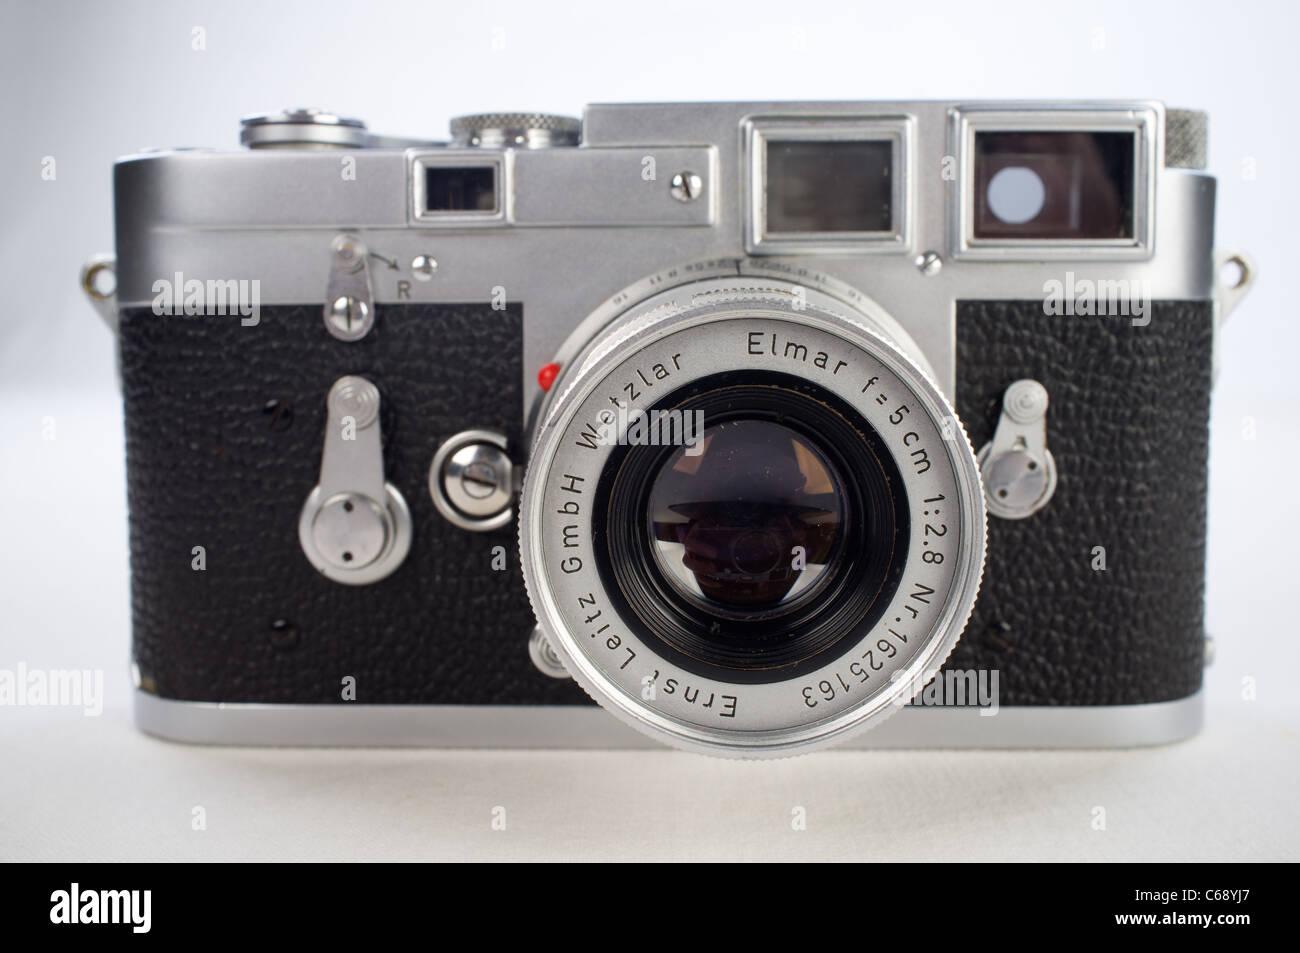 Leica filmkamera stockfotos leica filmkamera bilder alamy